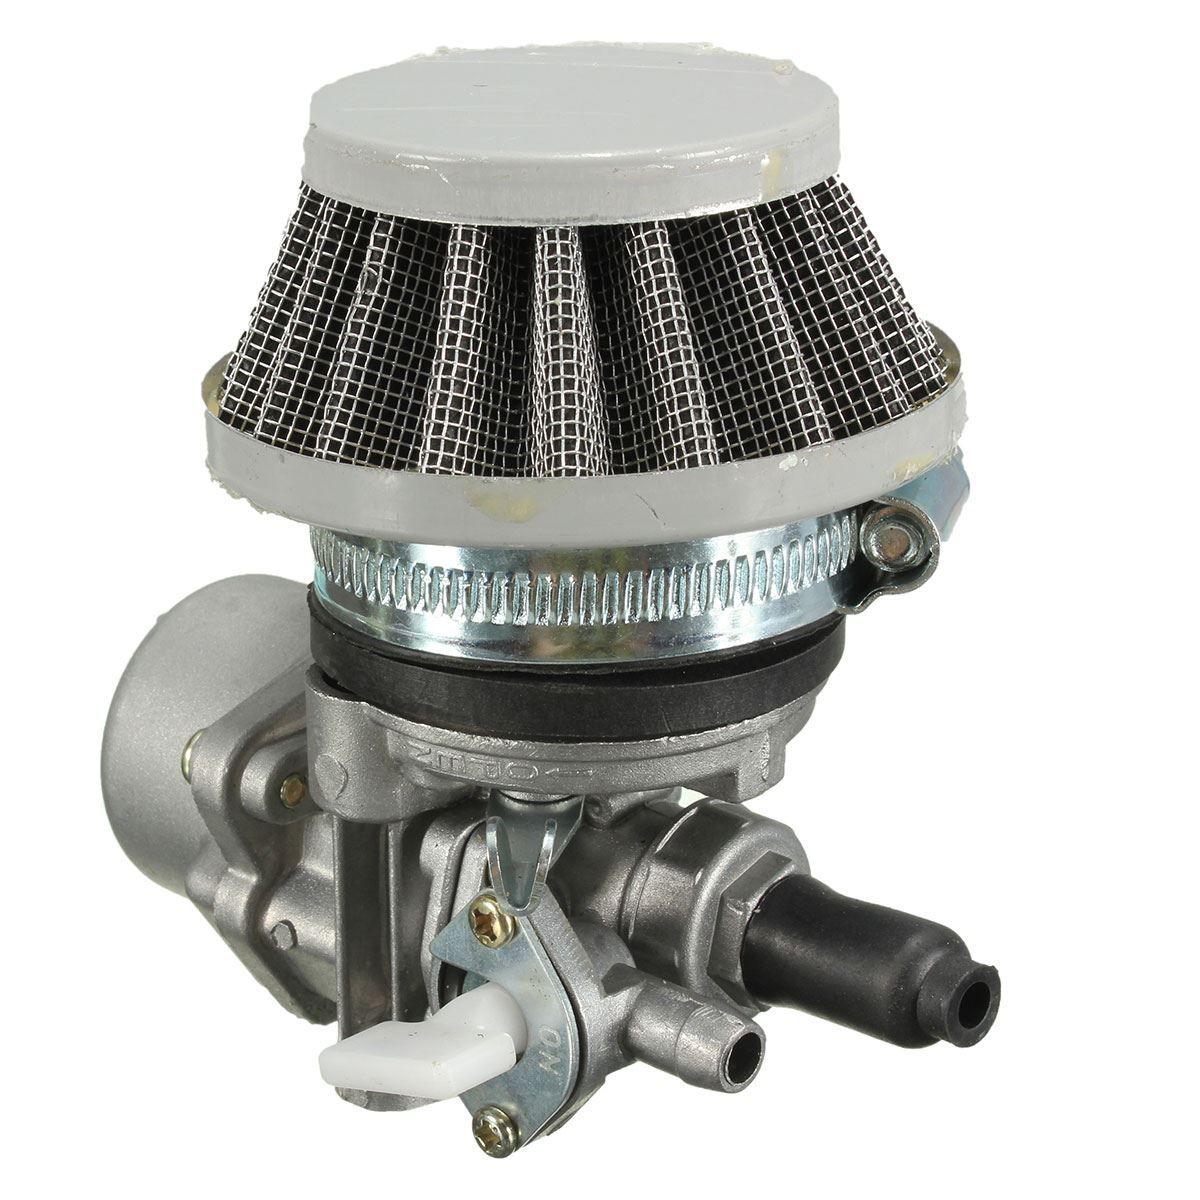 2015 Mini Carb Carburetor w/ Air Filter For 47cc 49cc Mini